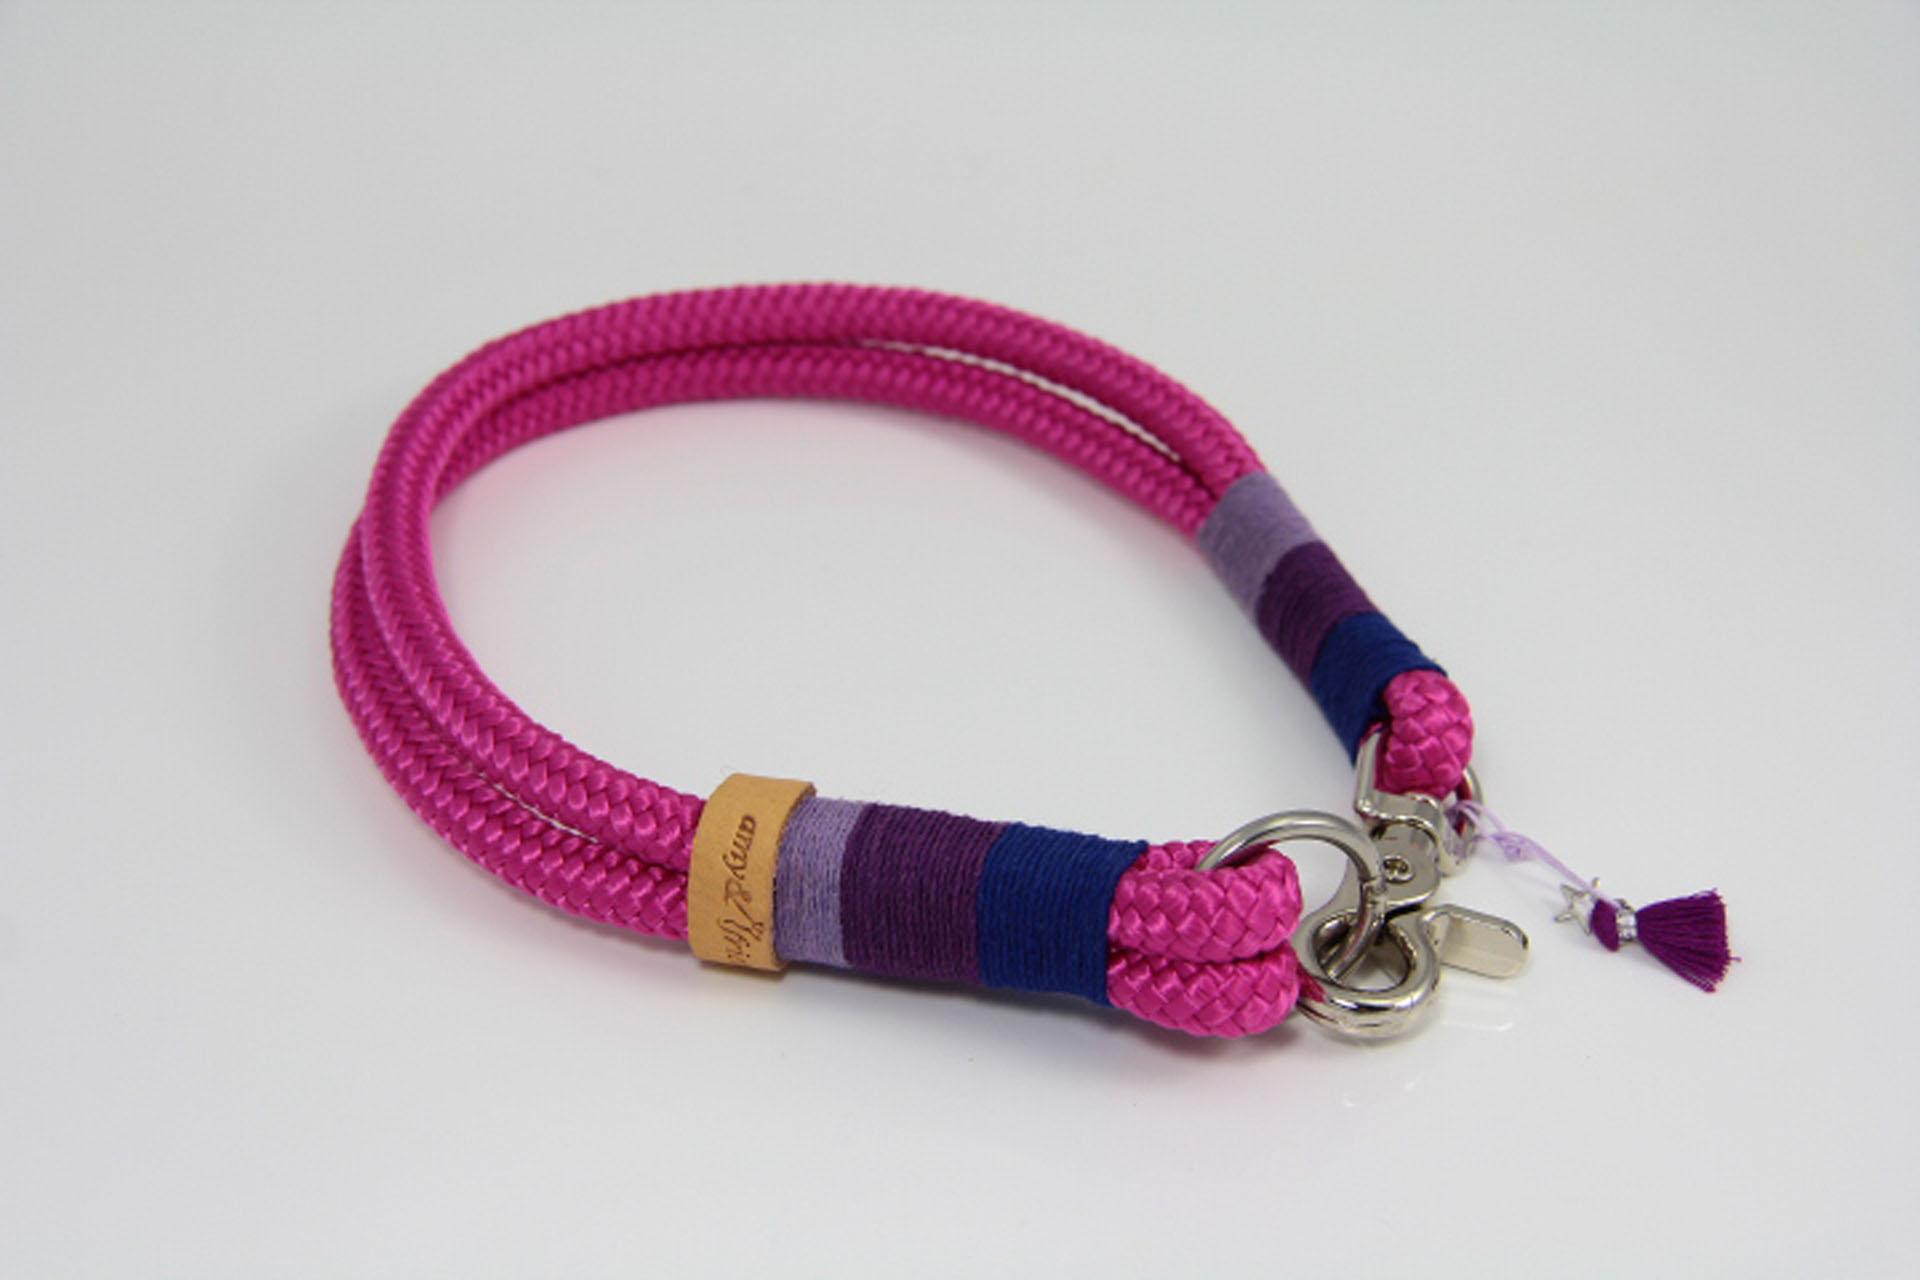 Tauhalsband-amy-and-friends-fuchsia-dunkelblau-purple-lavendel